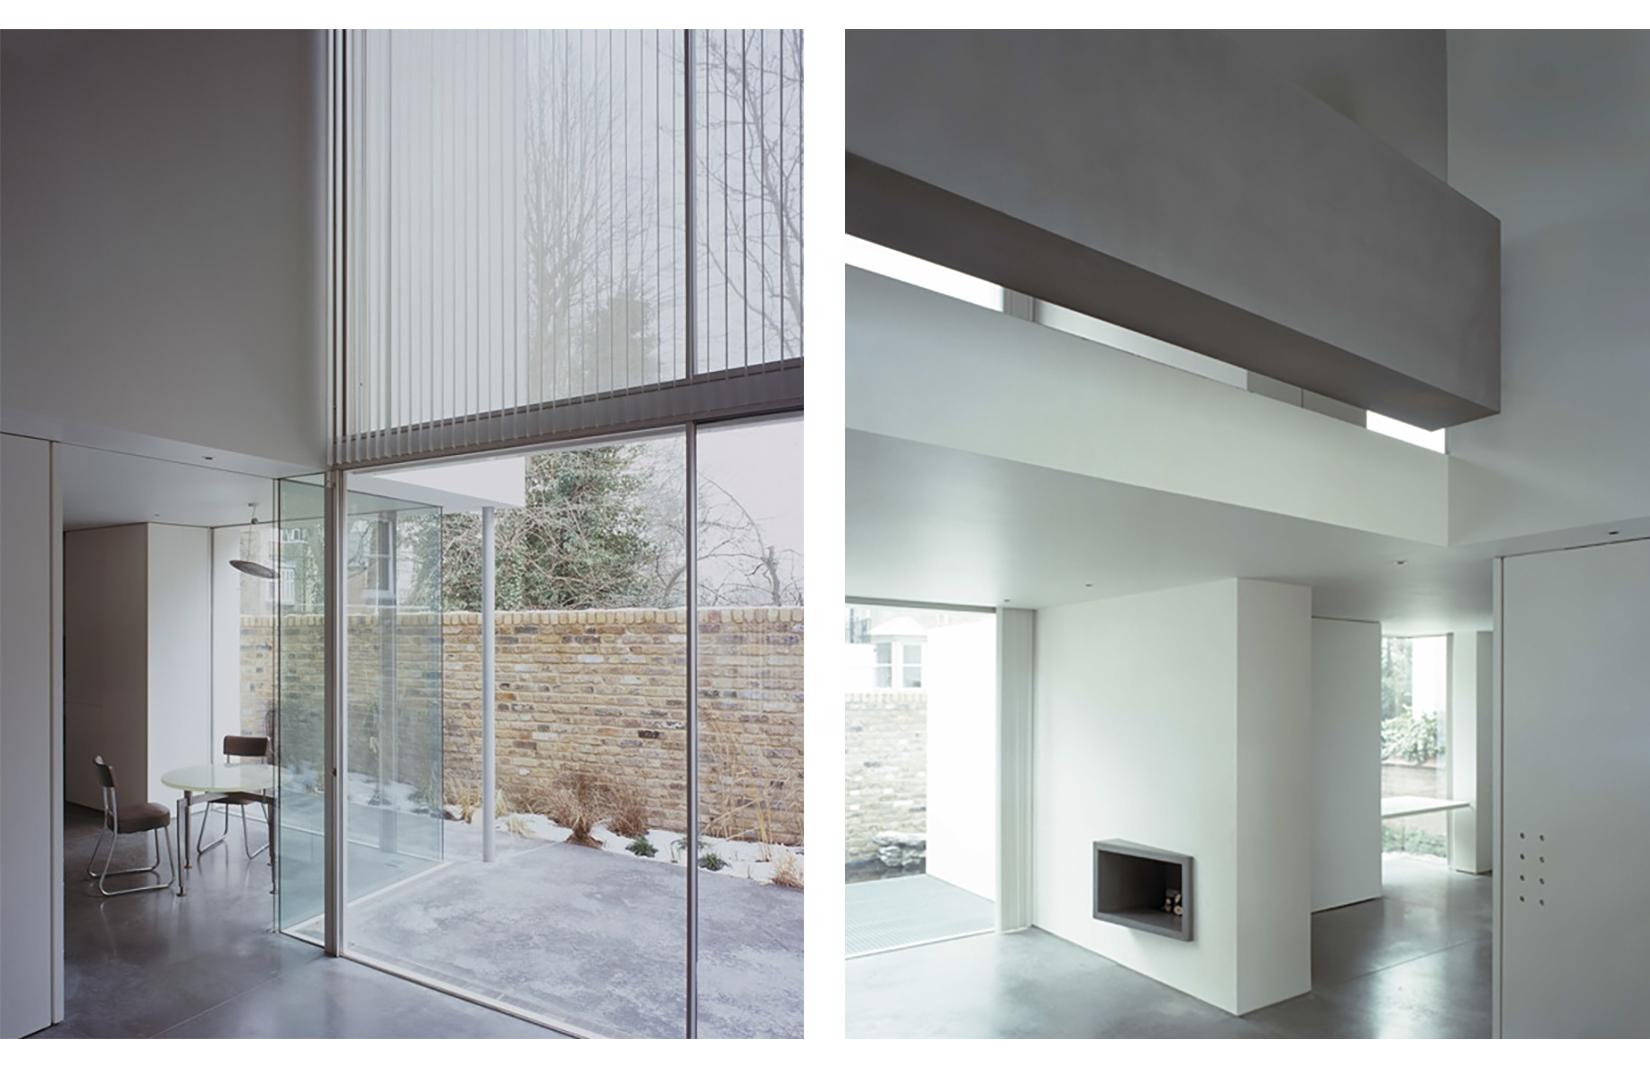 Photography: Courtesy of Guard Tillman Pollock Architects